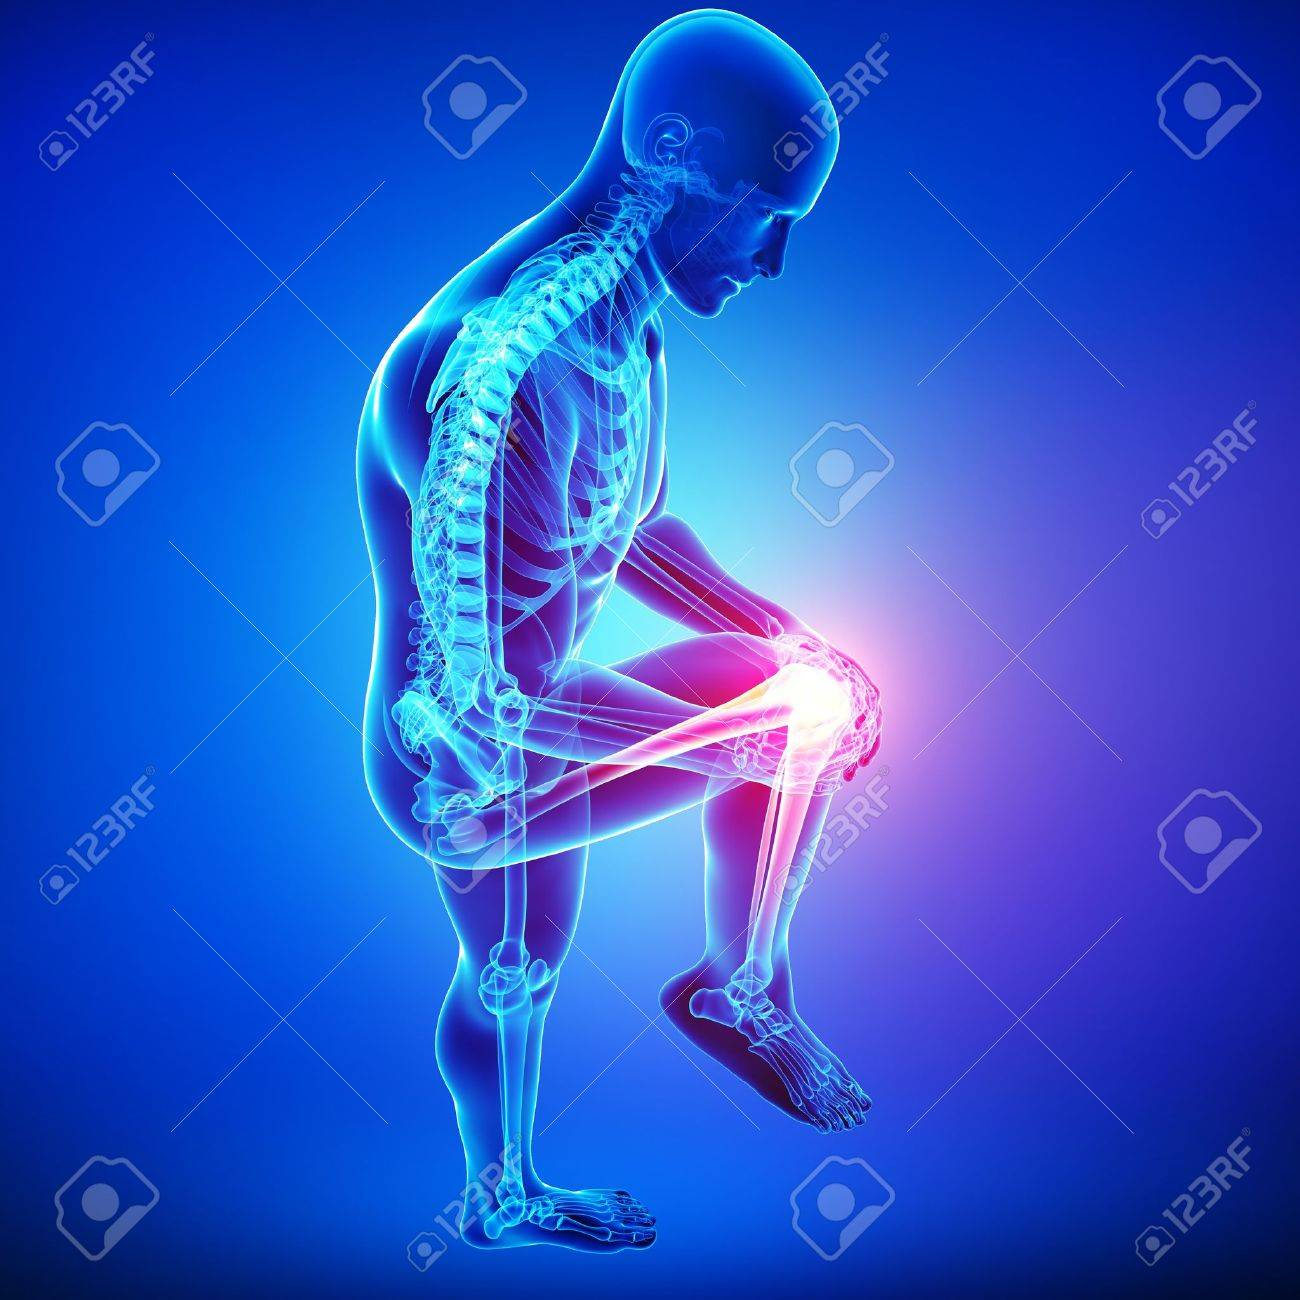 male knee pain Stock Photo - 15482489